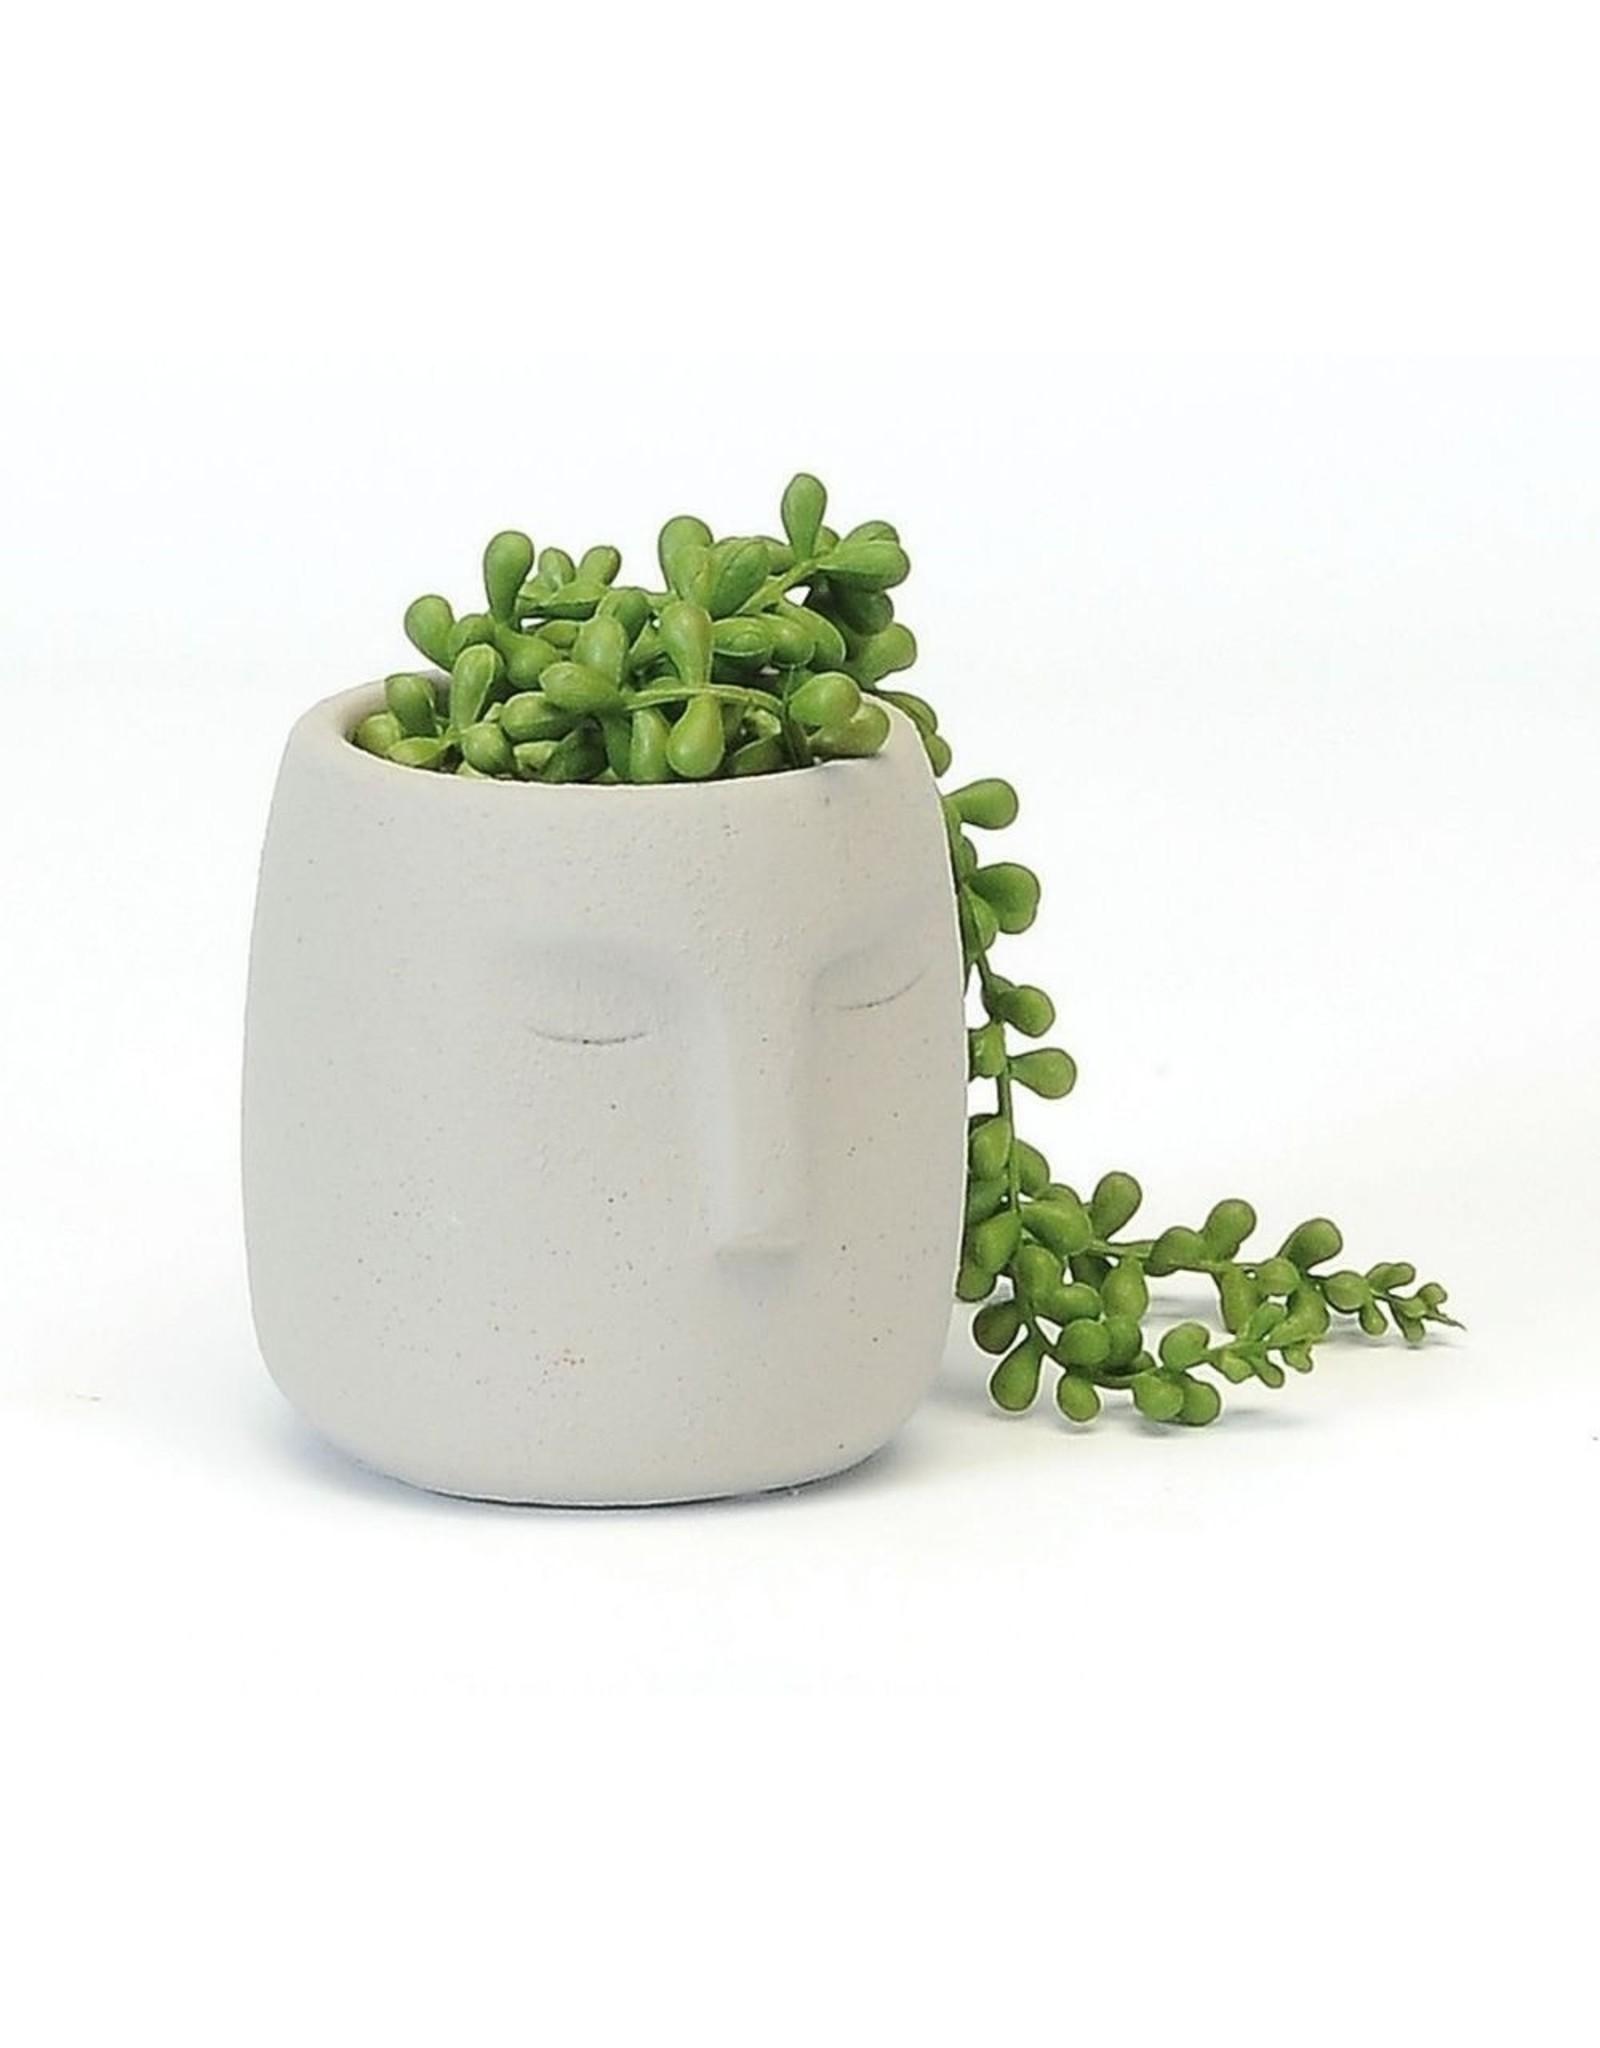 Face Planter - Small